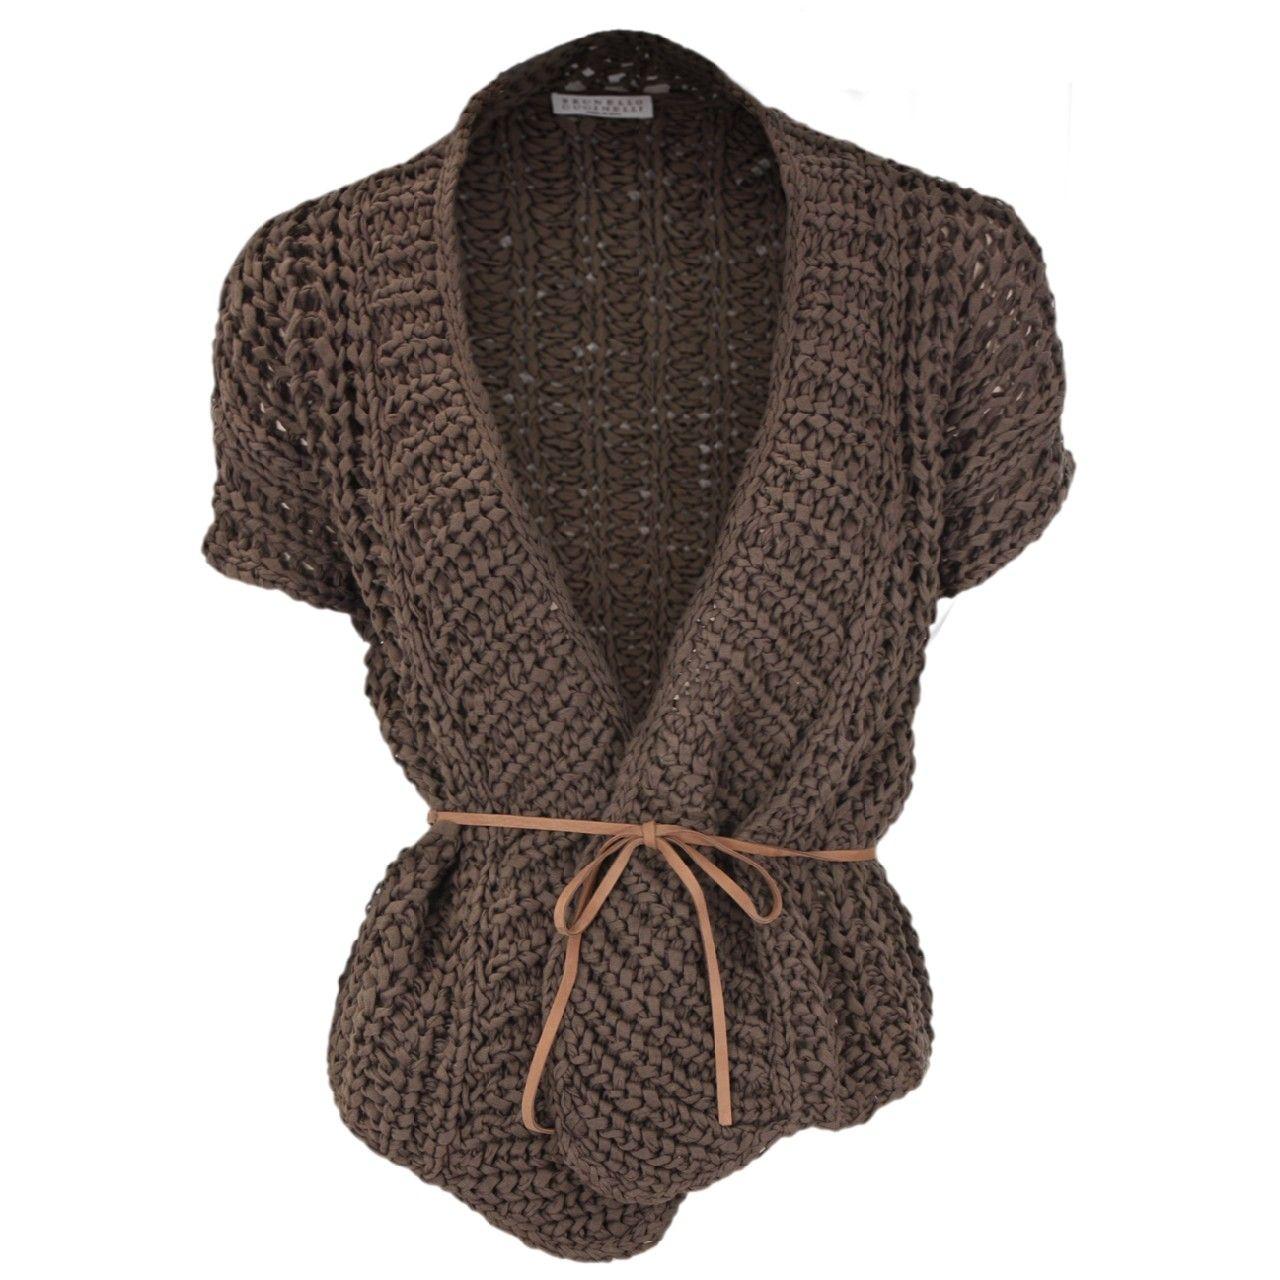 Hirshleifers - Brunello Cucinelli - Short Sleeve Cotton Linen ...